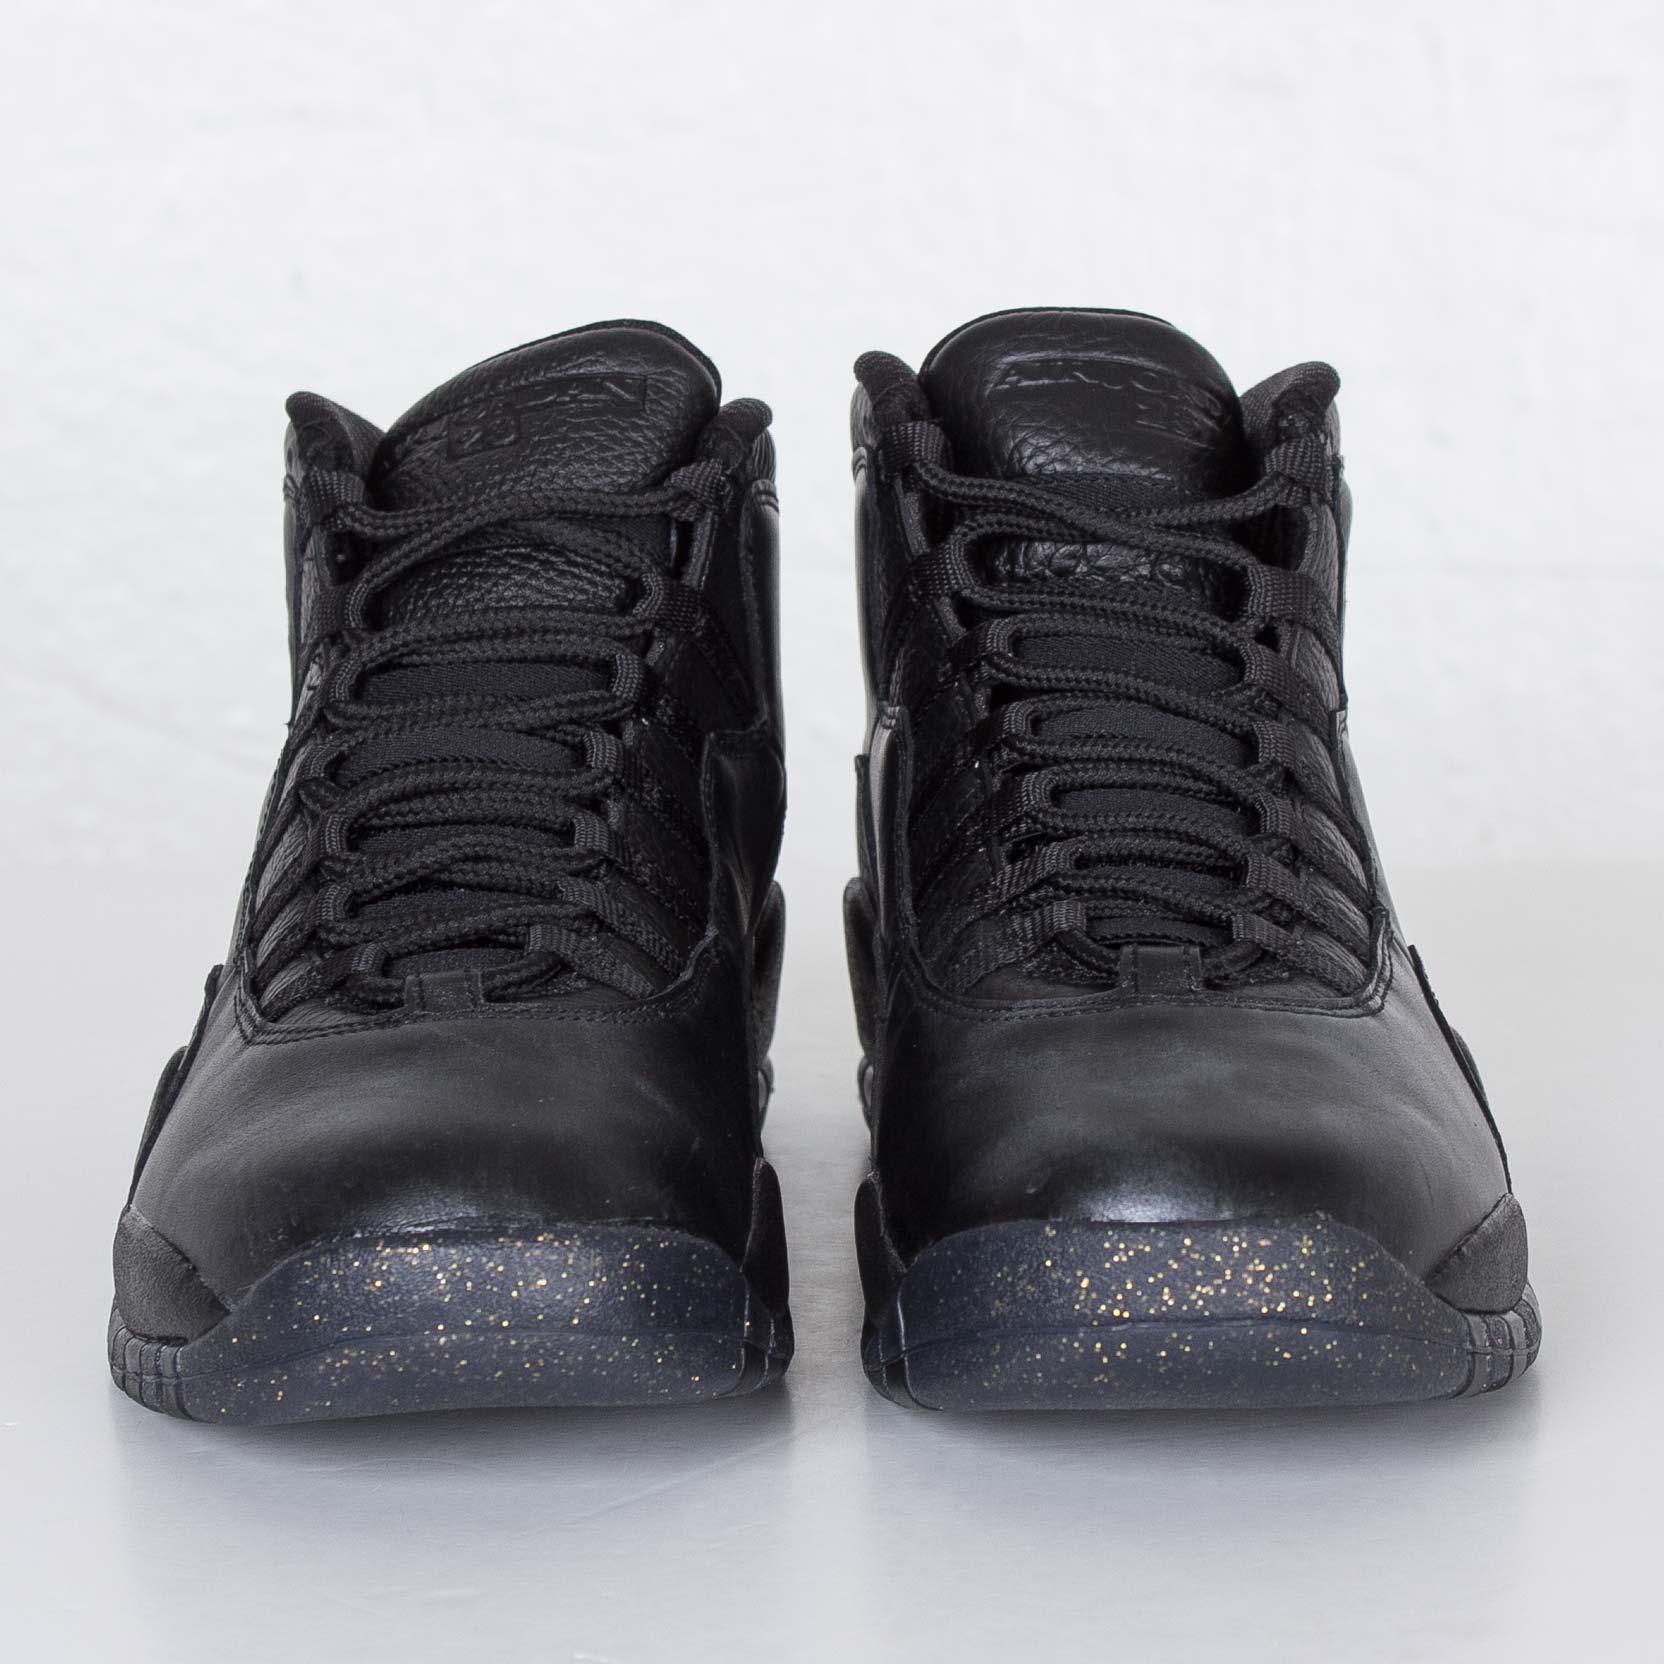 buy online fce95 b01c4 ... store jordan brand air jordan retro x 952a7 86b76